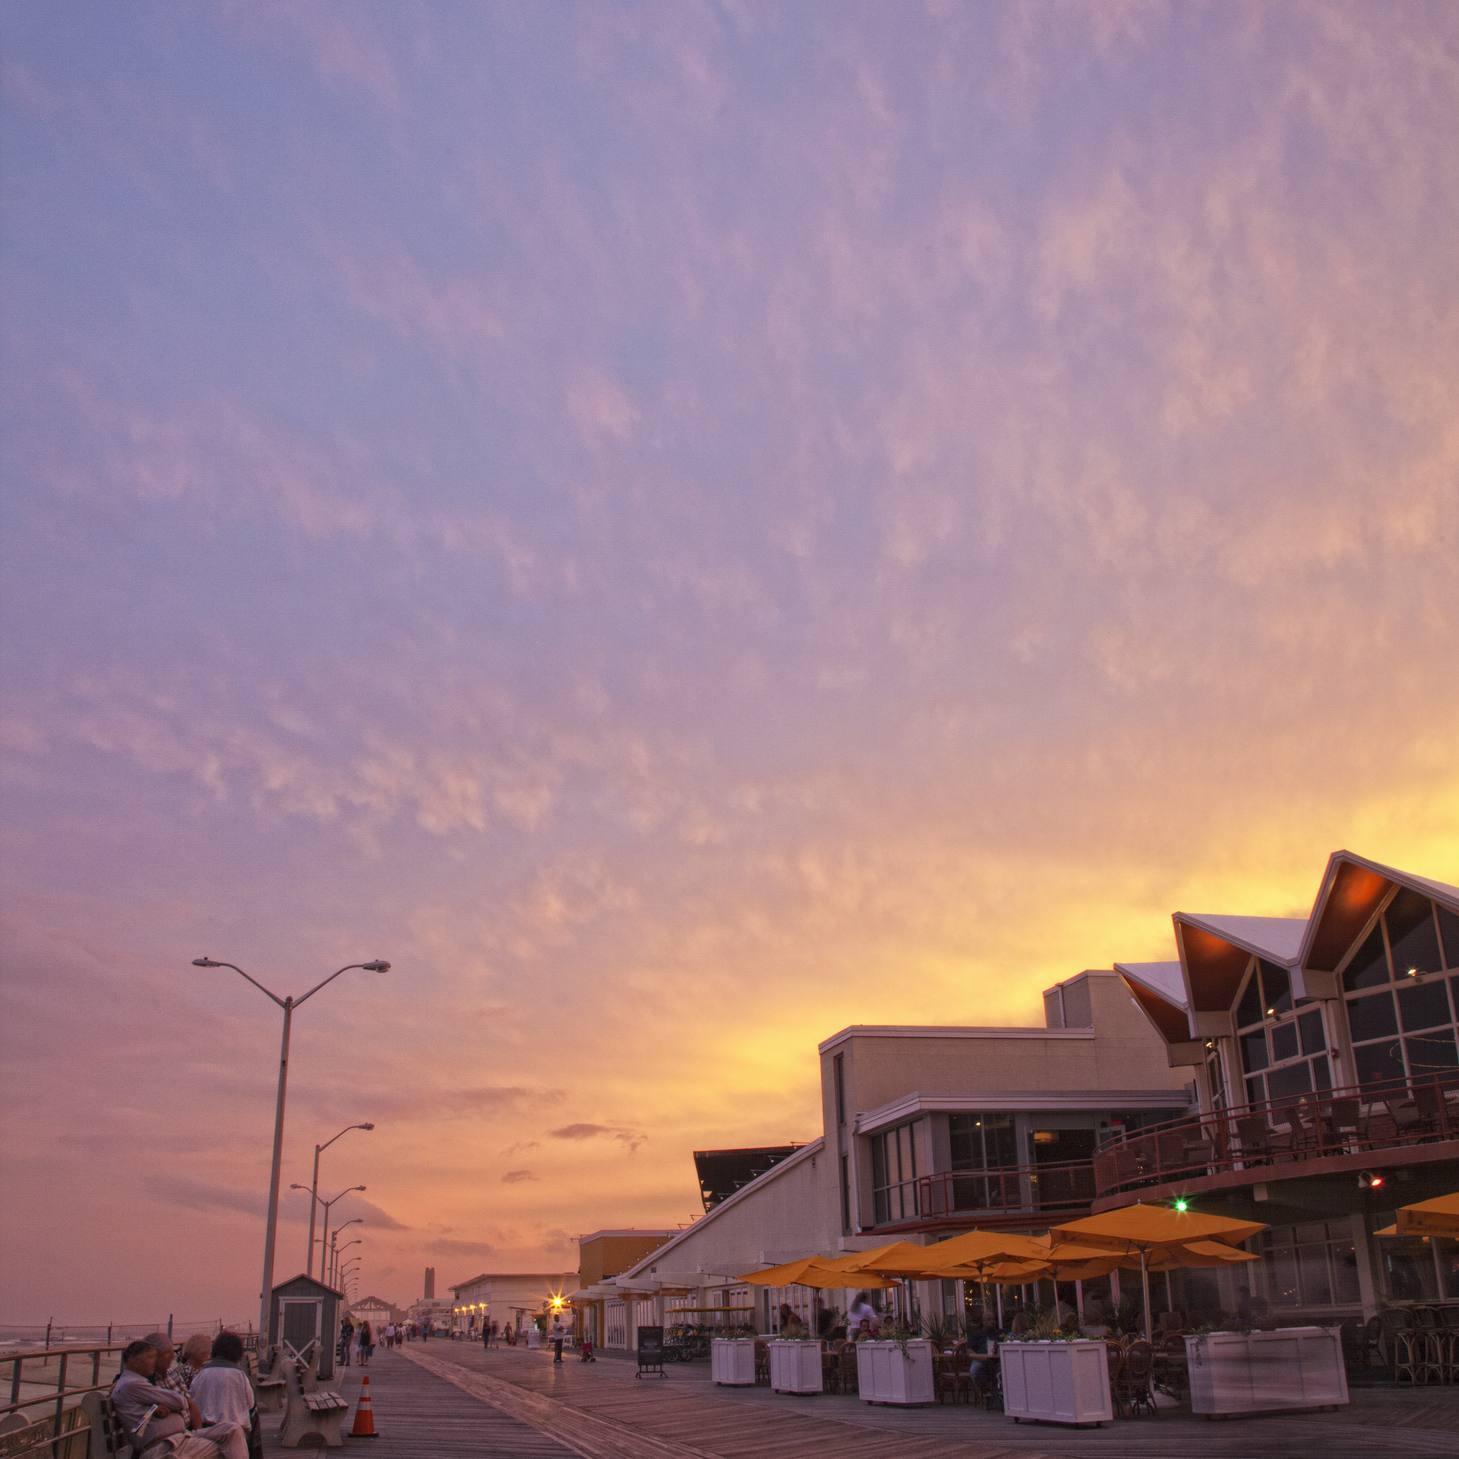 Asbury Park Boardwalk, Asbury Park, NJ